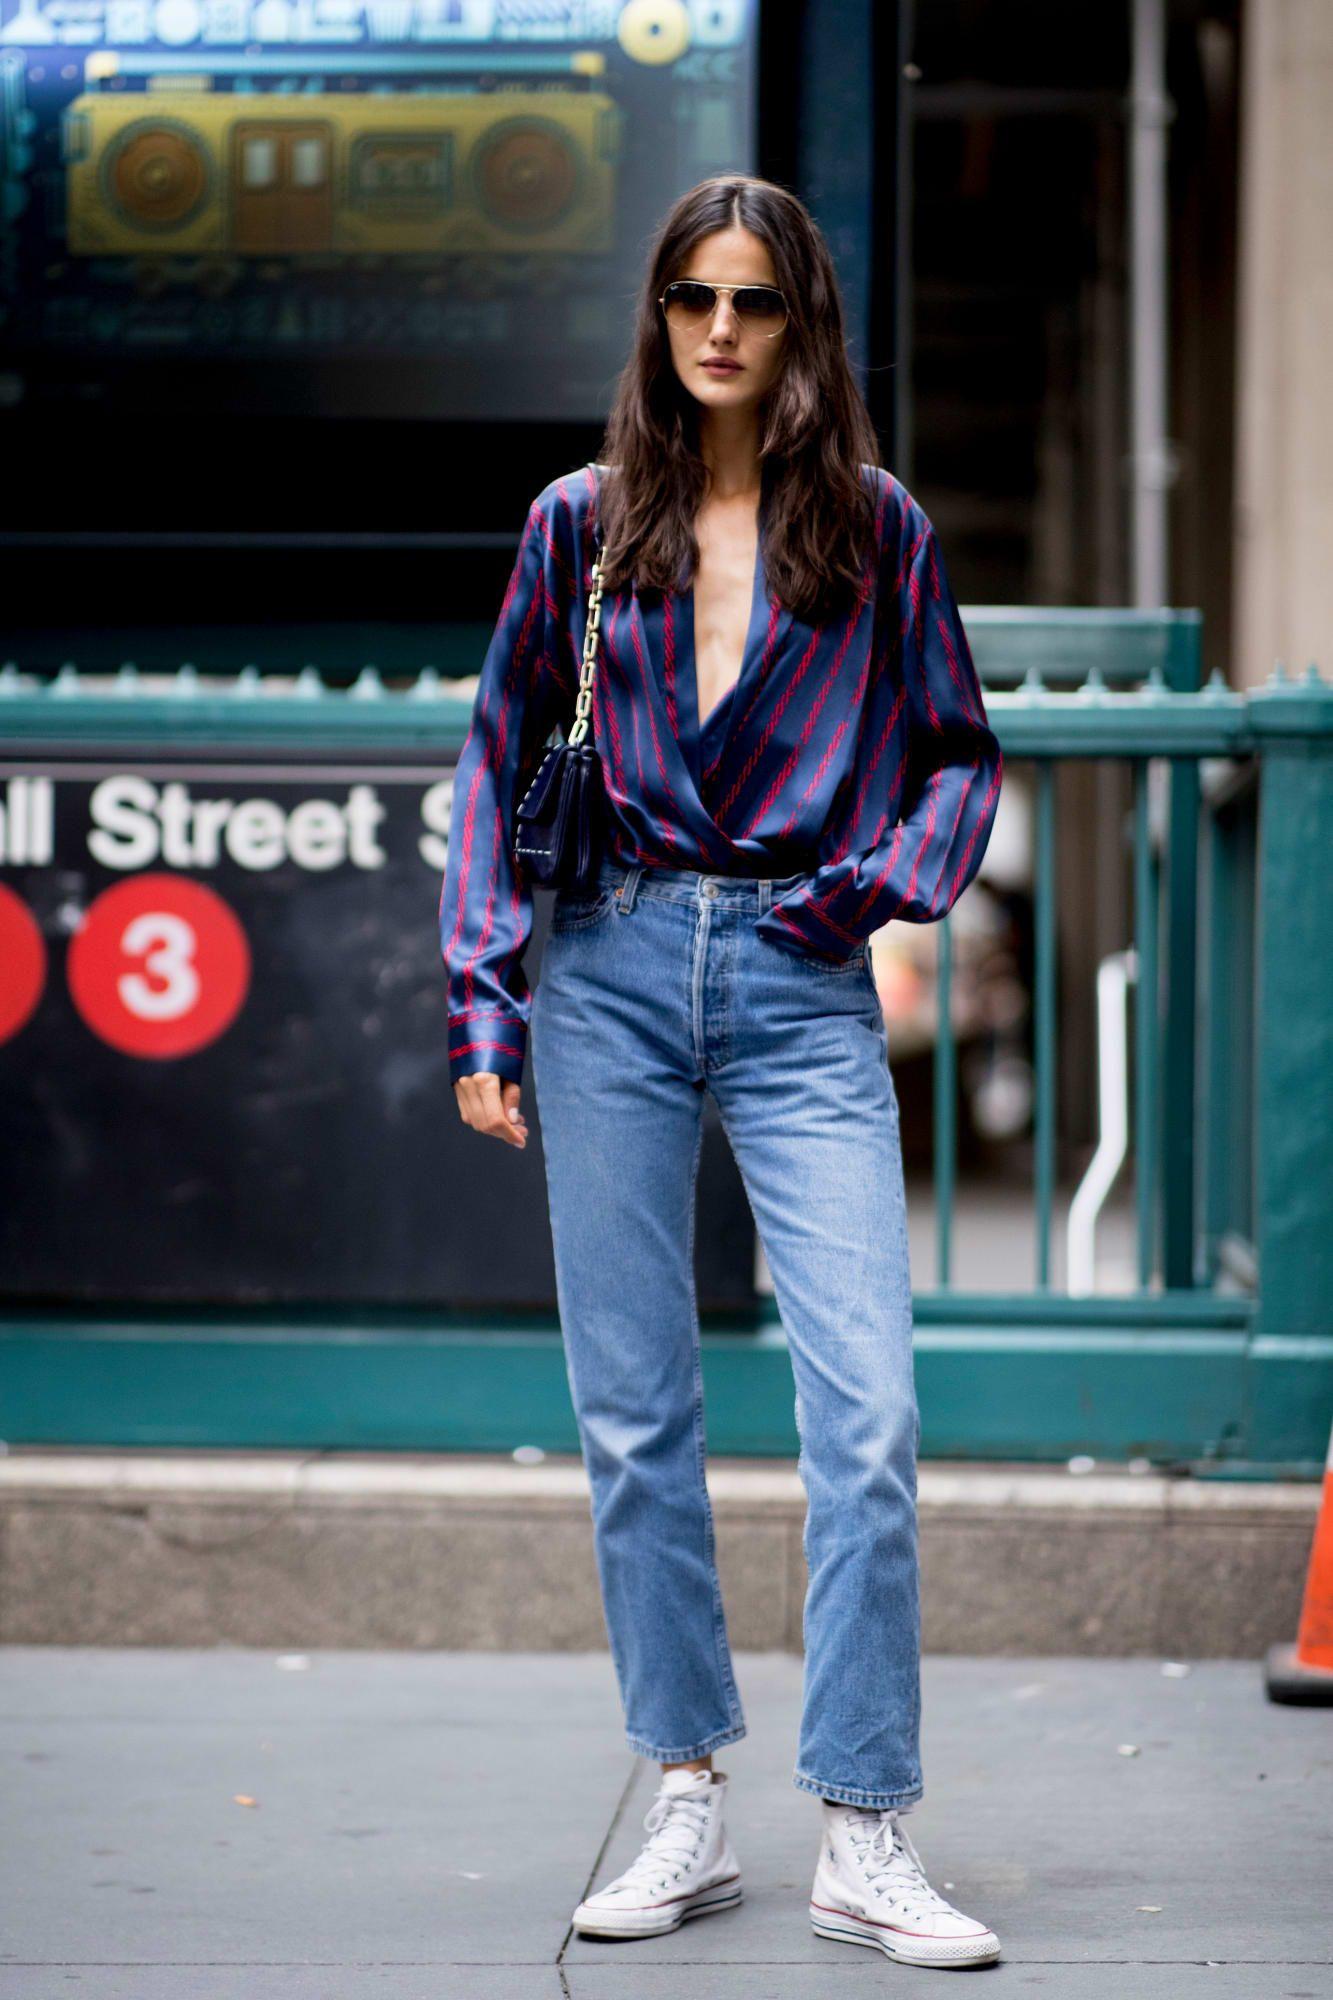 Bottega Veneta Bags and Shoes Were Everywhere on Day 2 of New York Fashion Week – Street Style